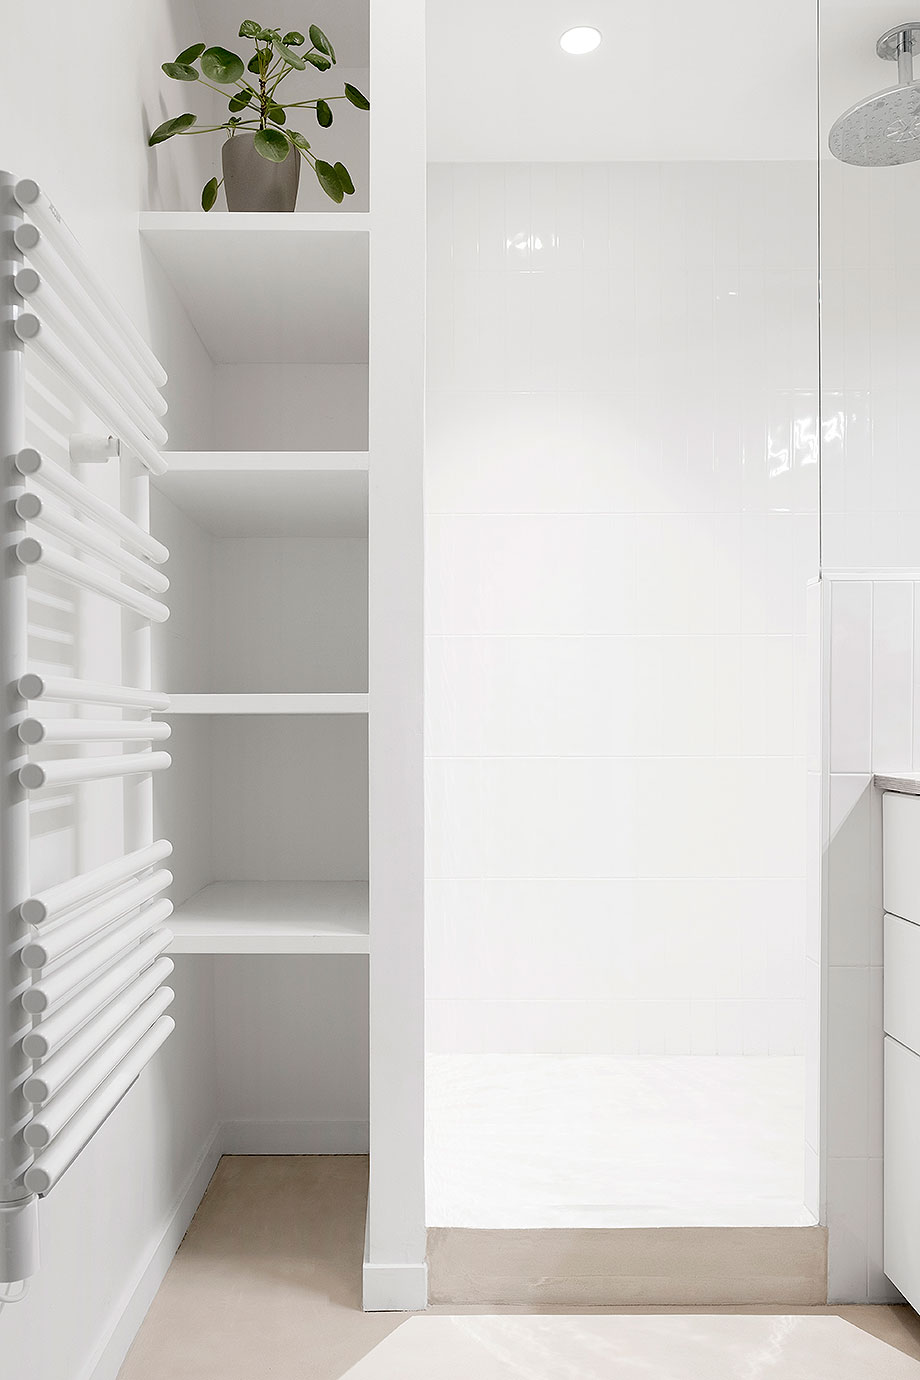 reforma integral de un apartamento en paris por anthropie architecture (s) (13) - foto juliette alexandre